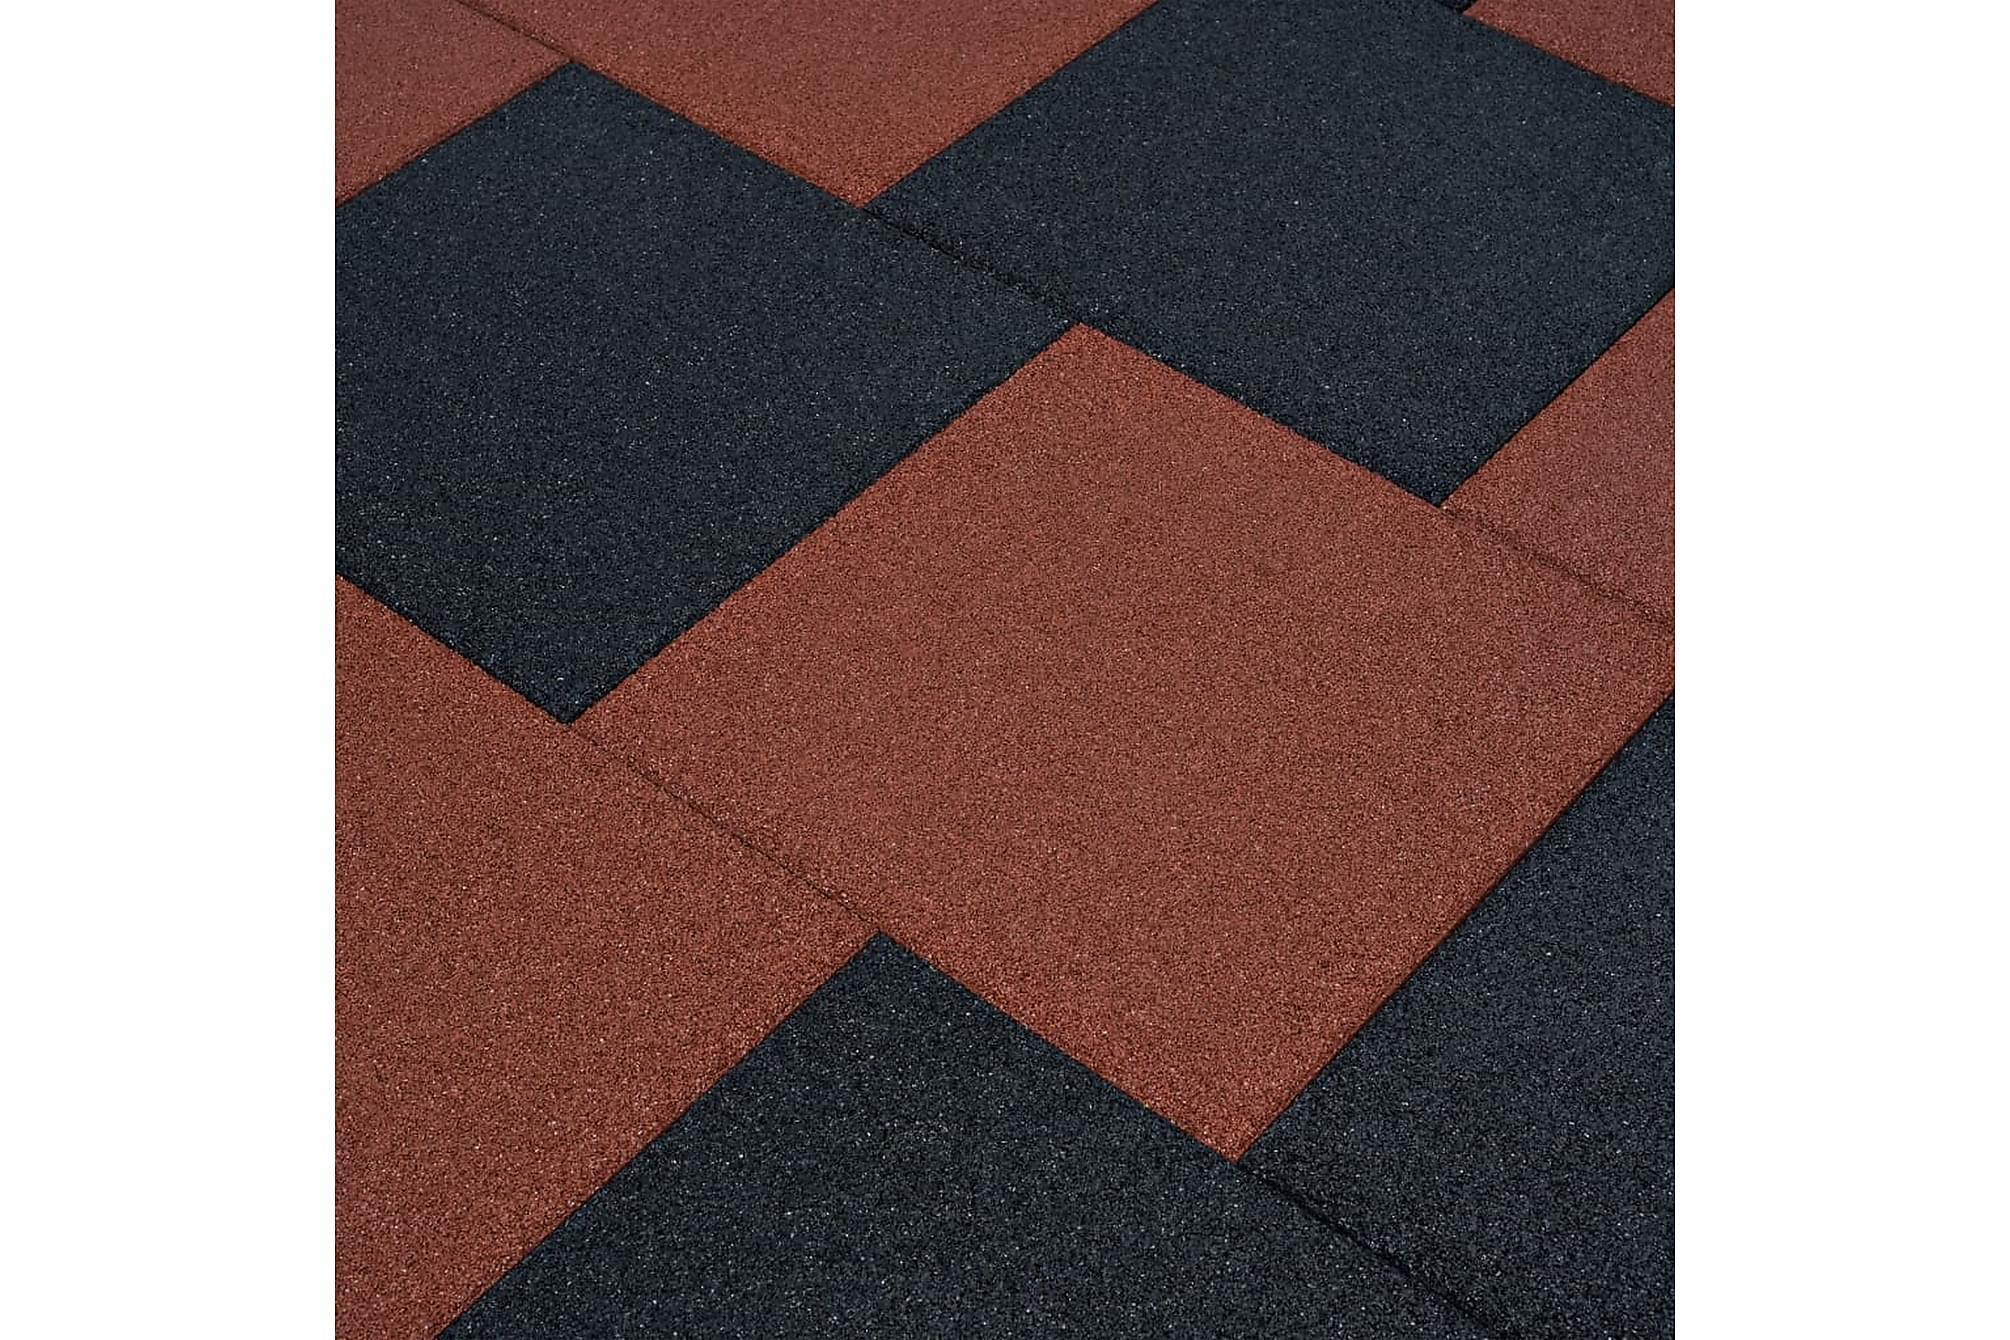 Fallskyddsmattor 12 st gummi 50x50x3 cm röd, Golvskydd